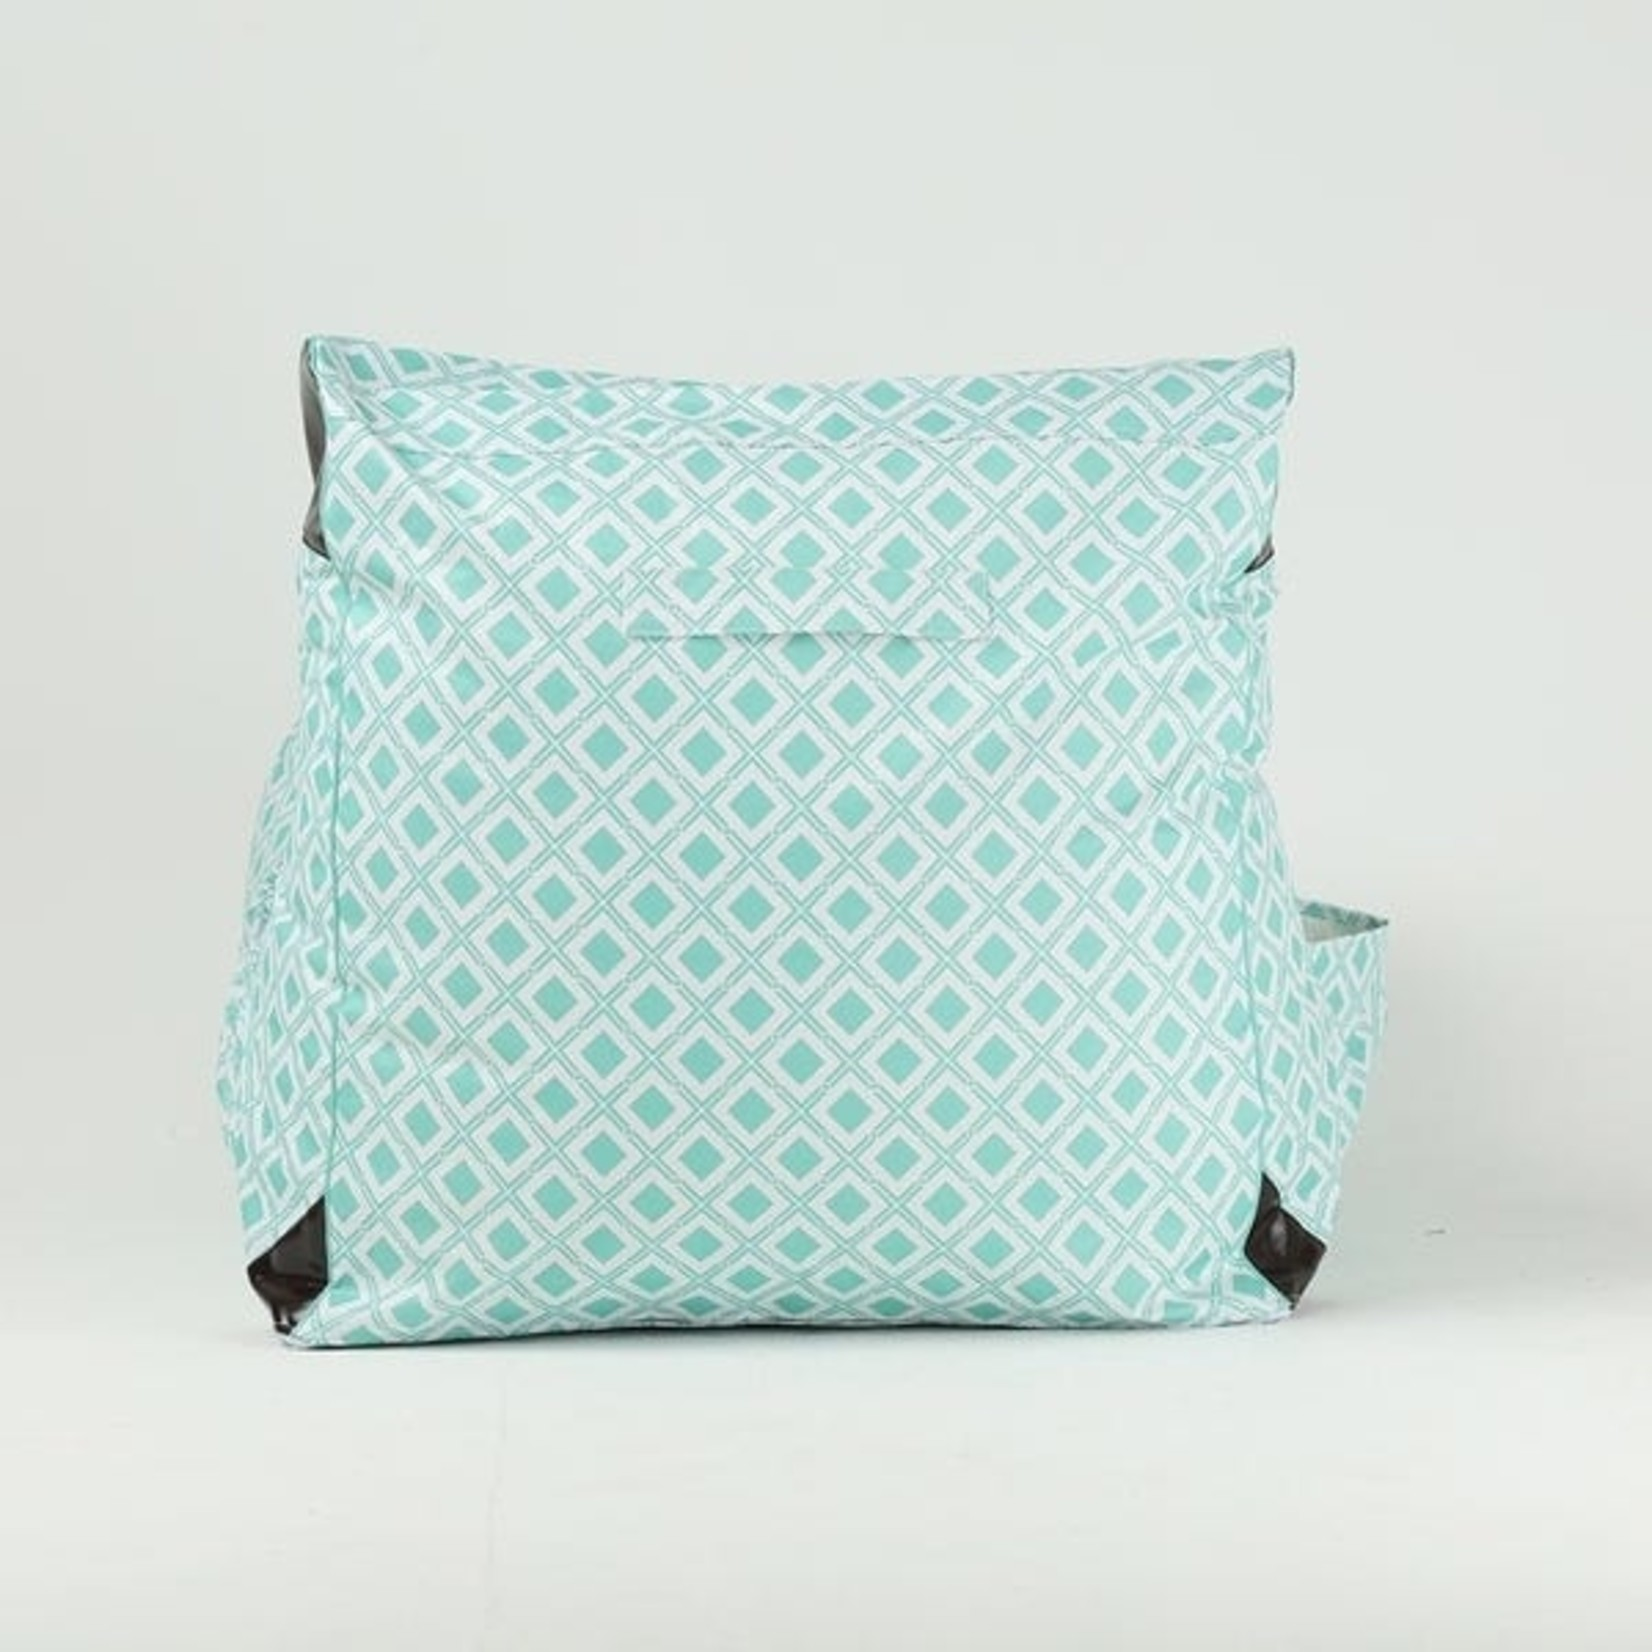 Paola Tiles lounge chair